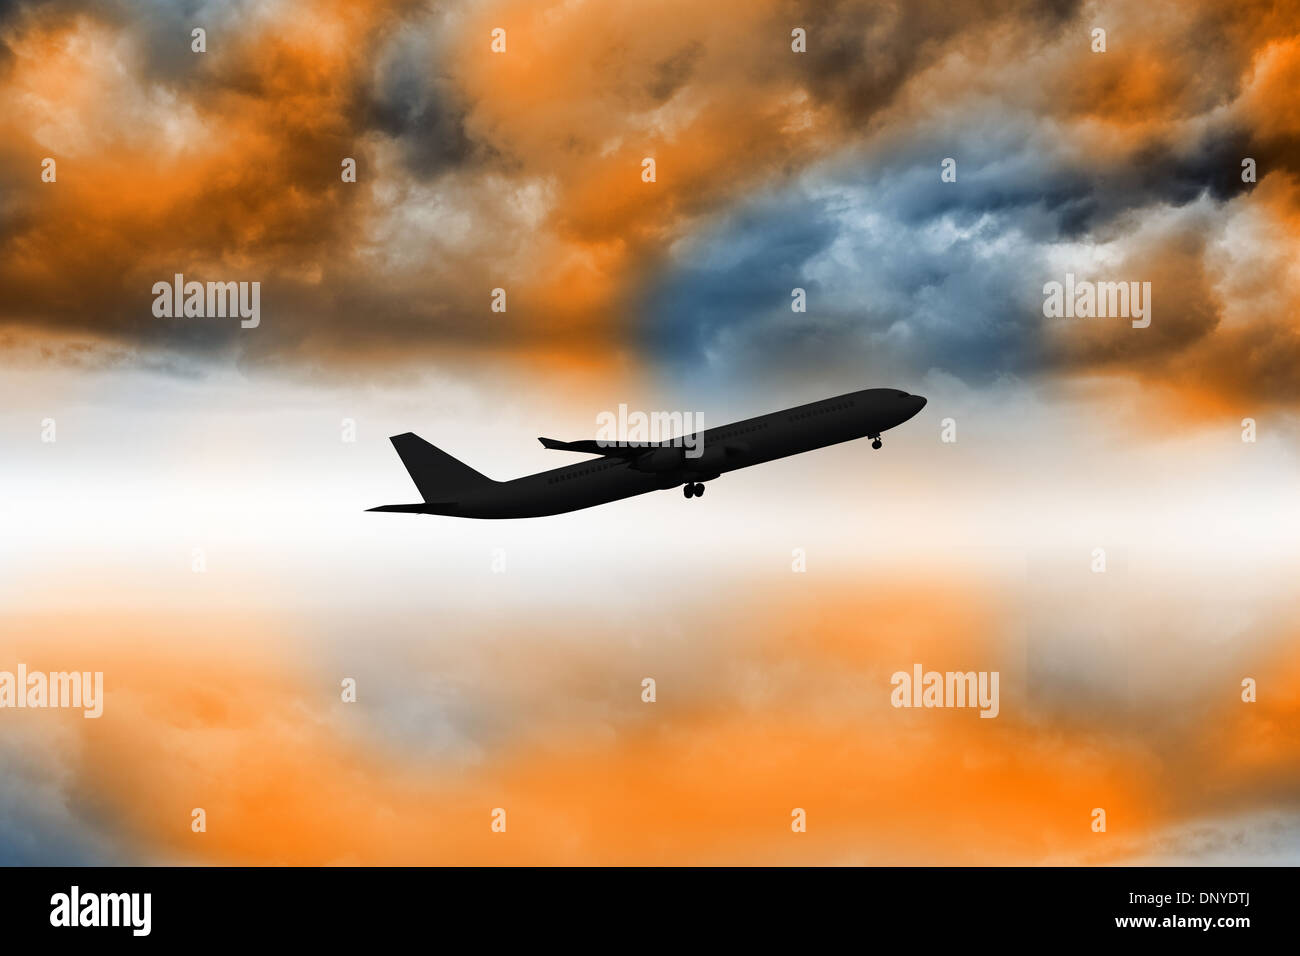 Airplane flying over orange sky - Stock Image